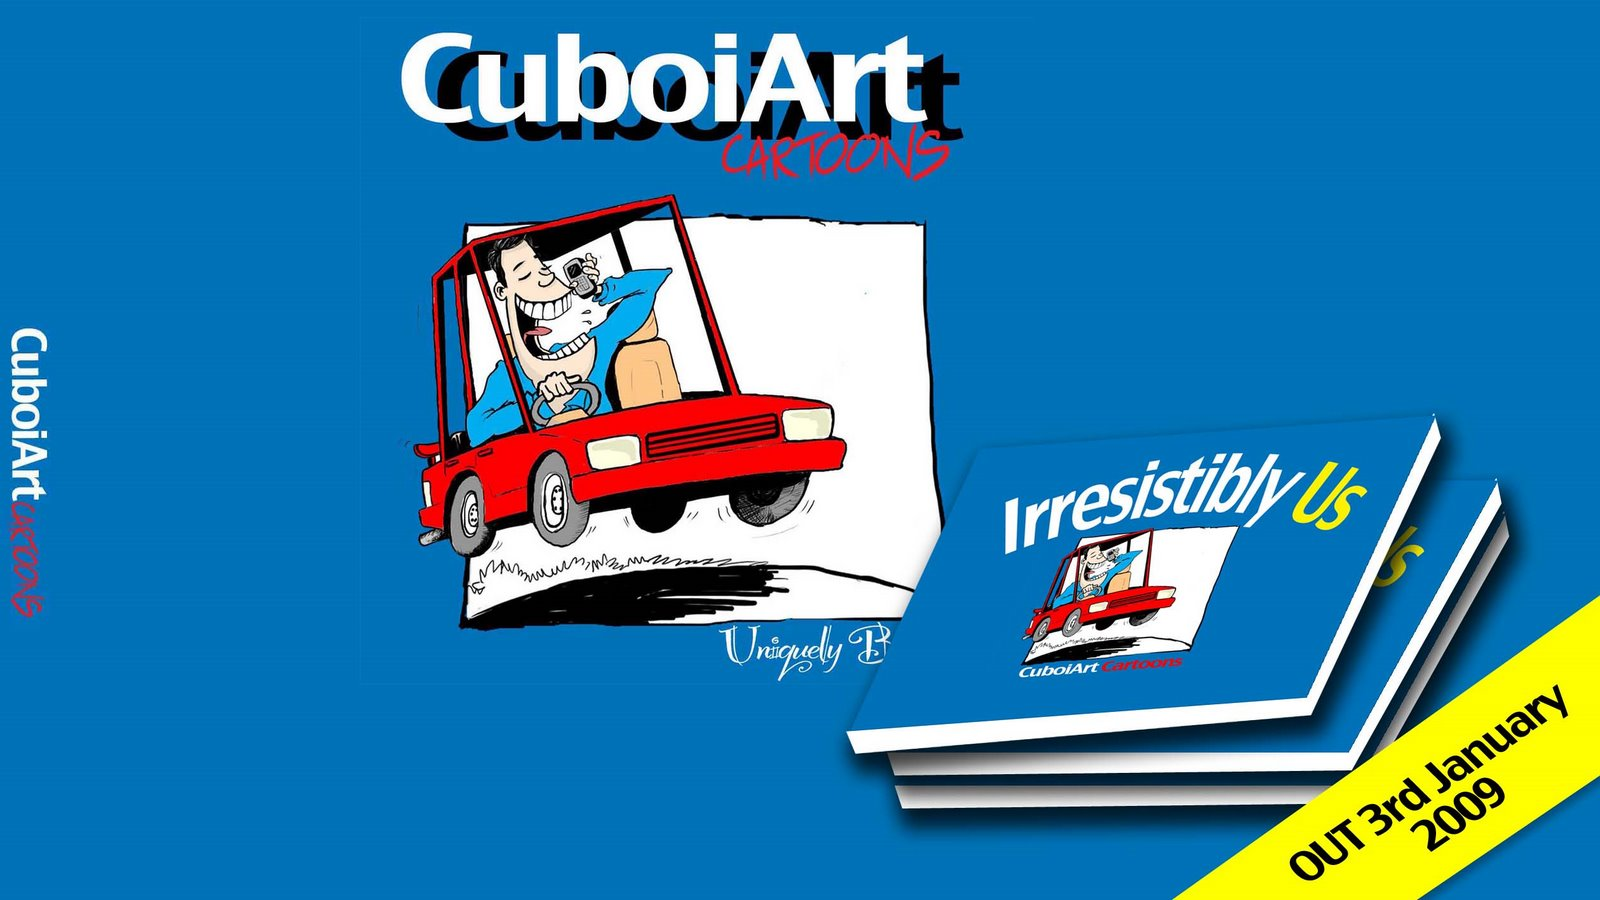 CuboiArt